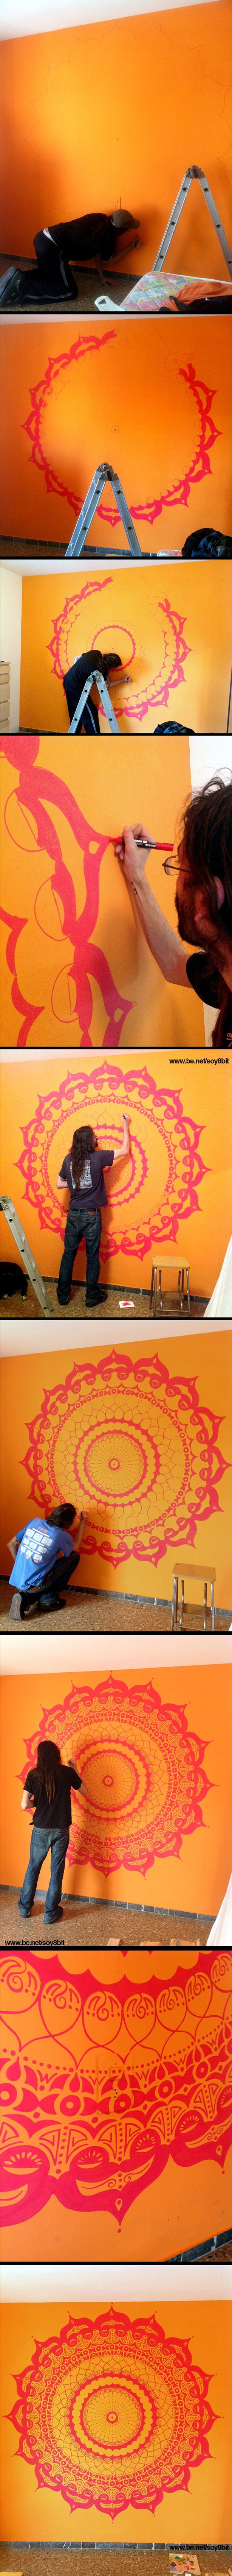 Mandala Wall, pintado por Héctor Sánchez...                                                                                                                                                                                 Más